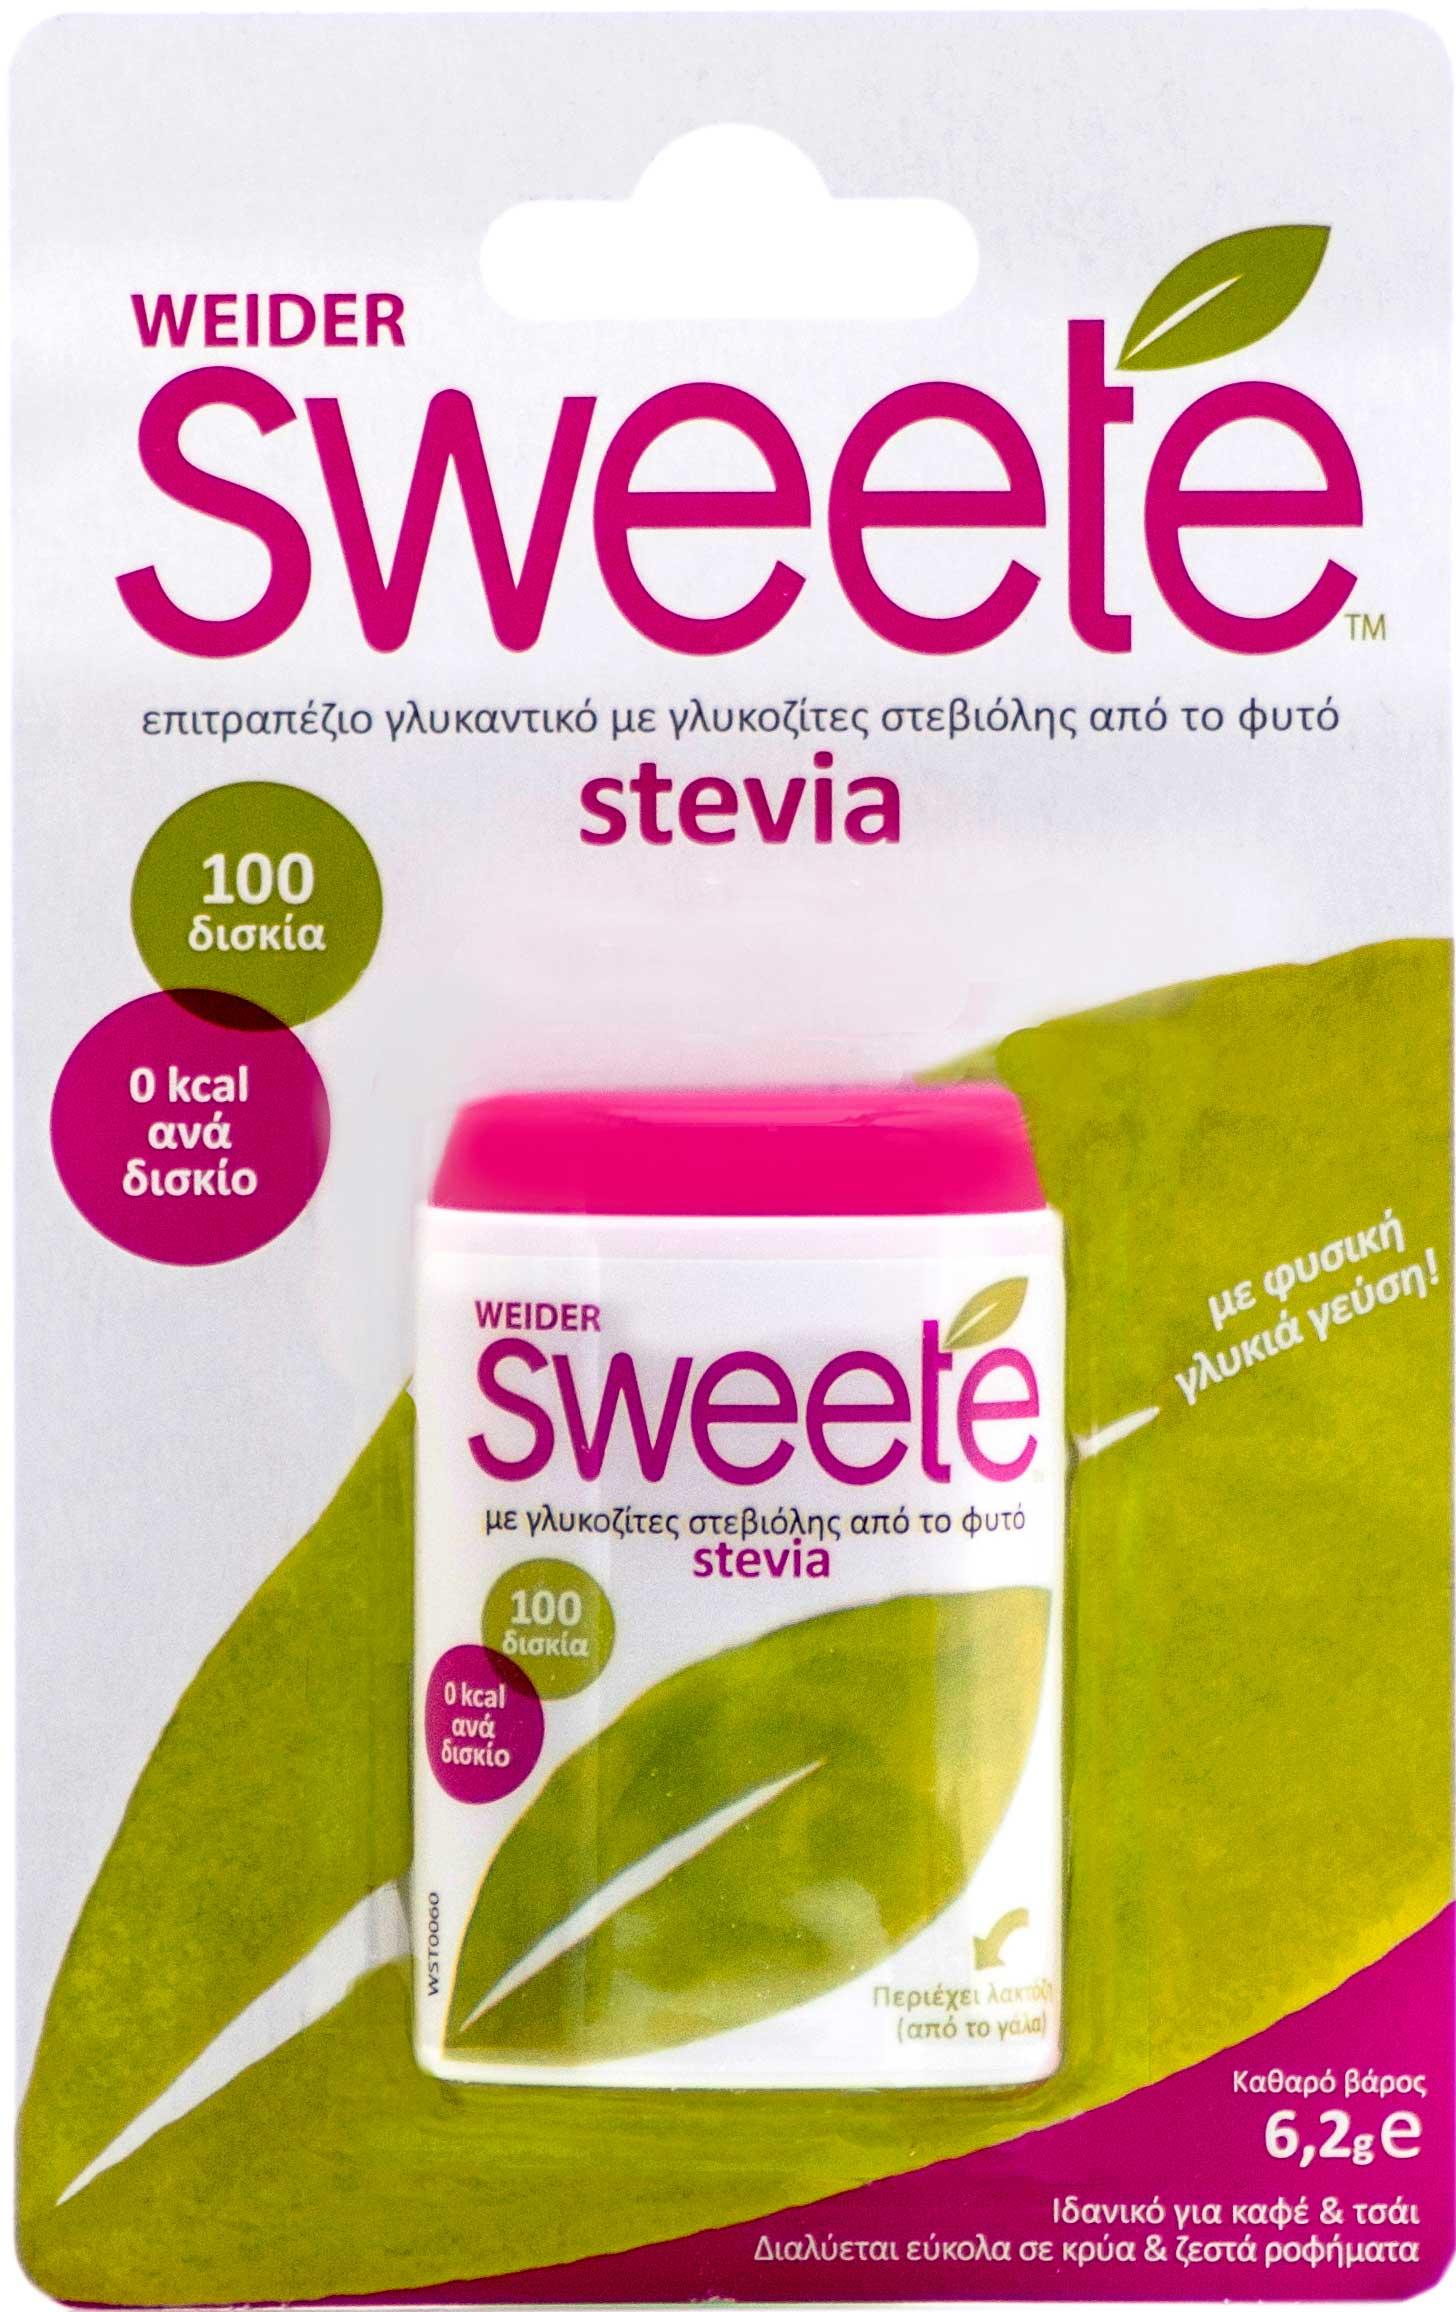 Stevia όπως λέμε σκέτη γλύκα